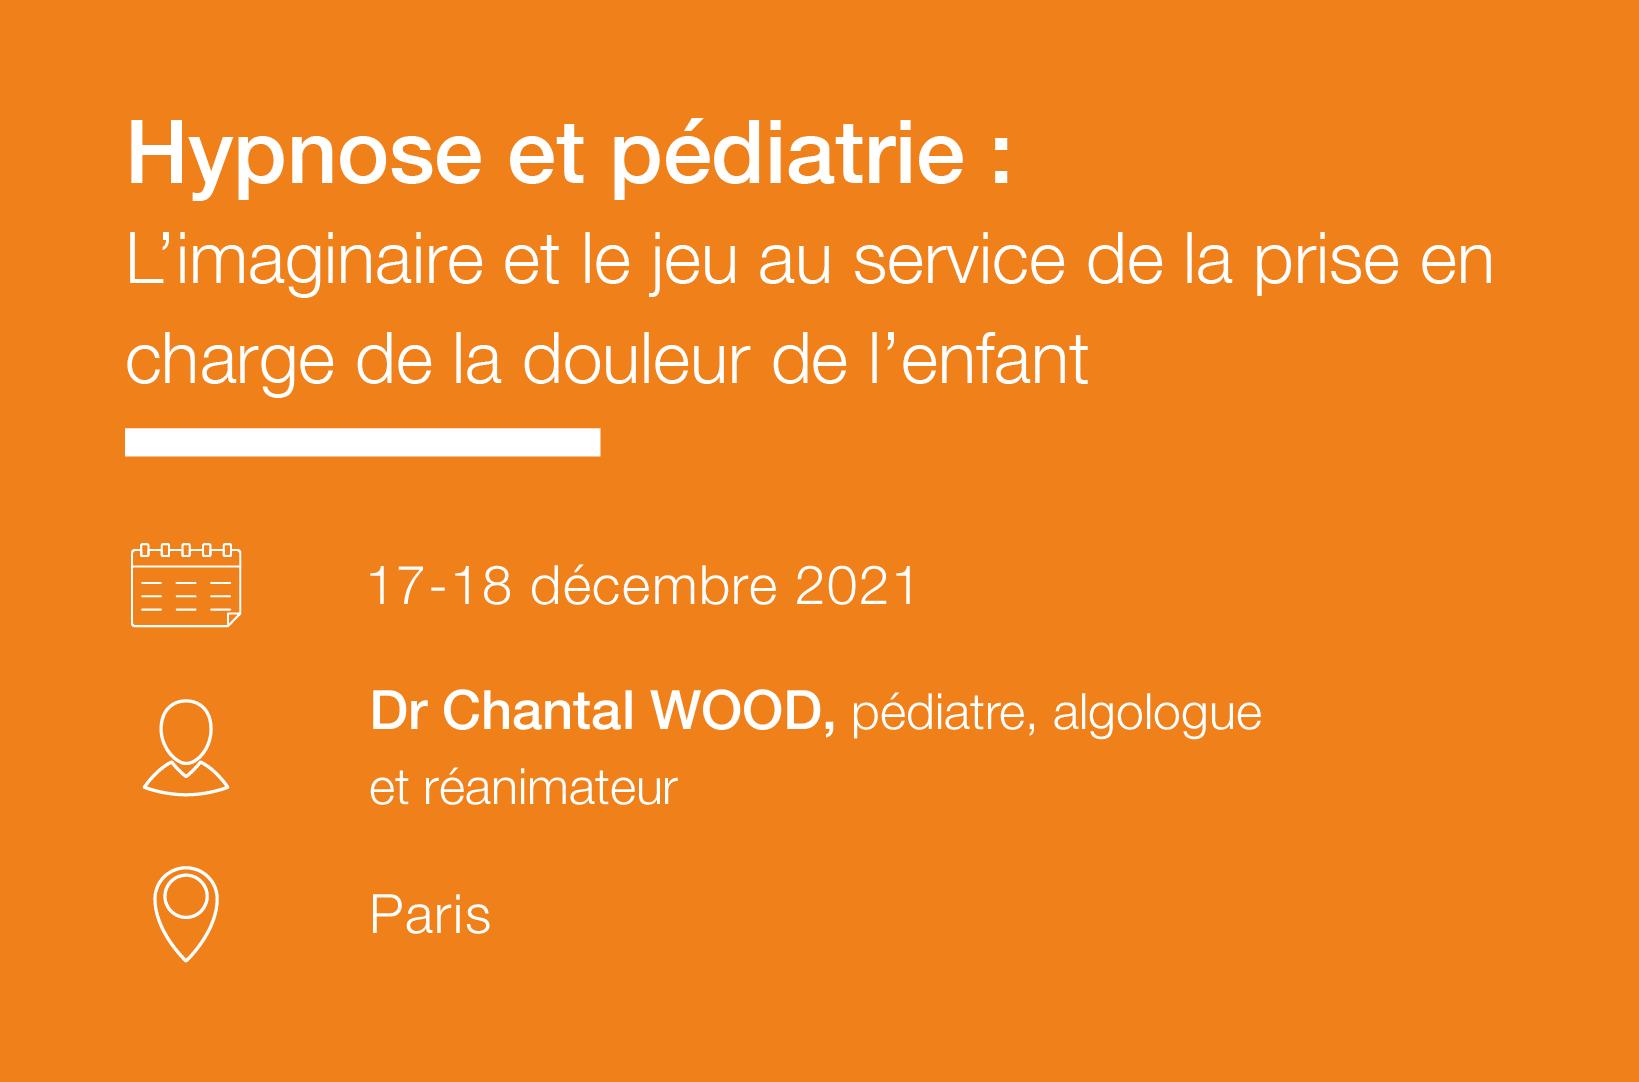 Seminaire Hypnose et pediatrie IFH